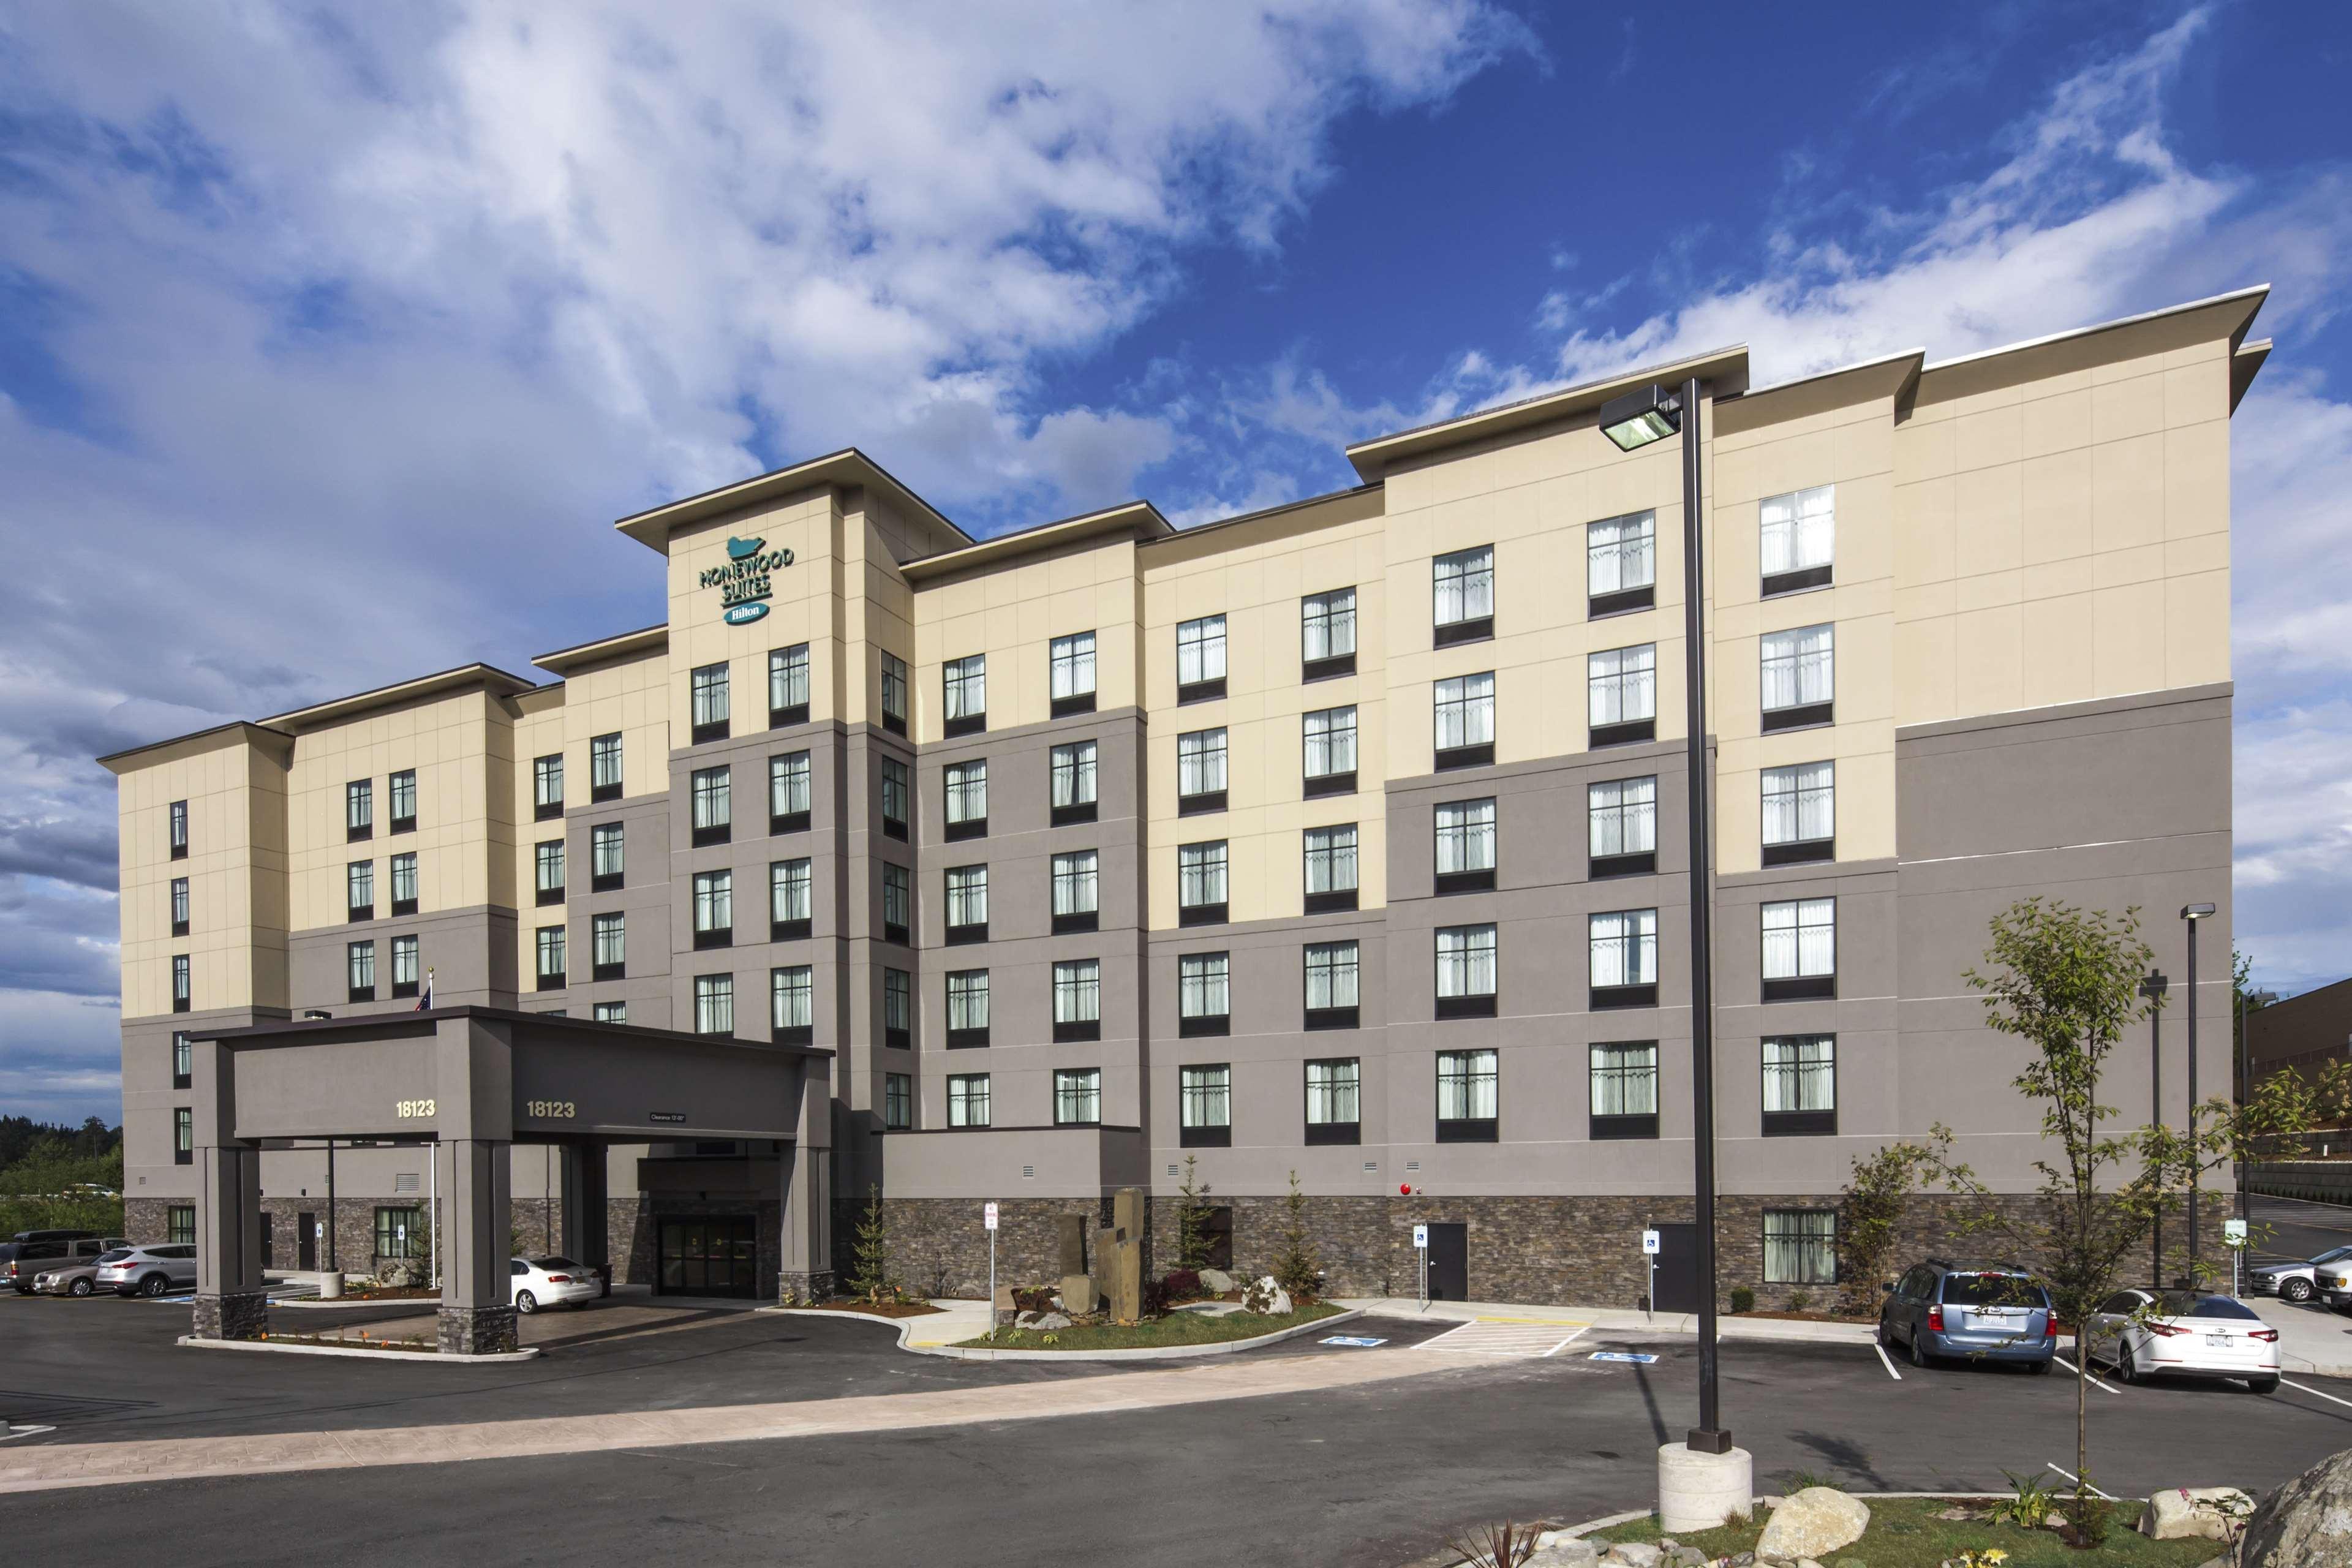 Homewood Suites by Hilton Seattle/Lynnwood, Snohomish